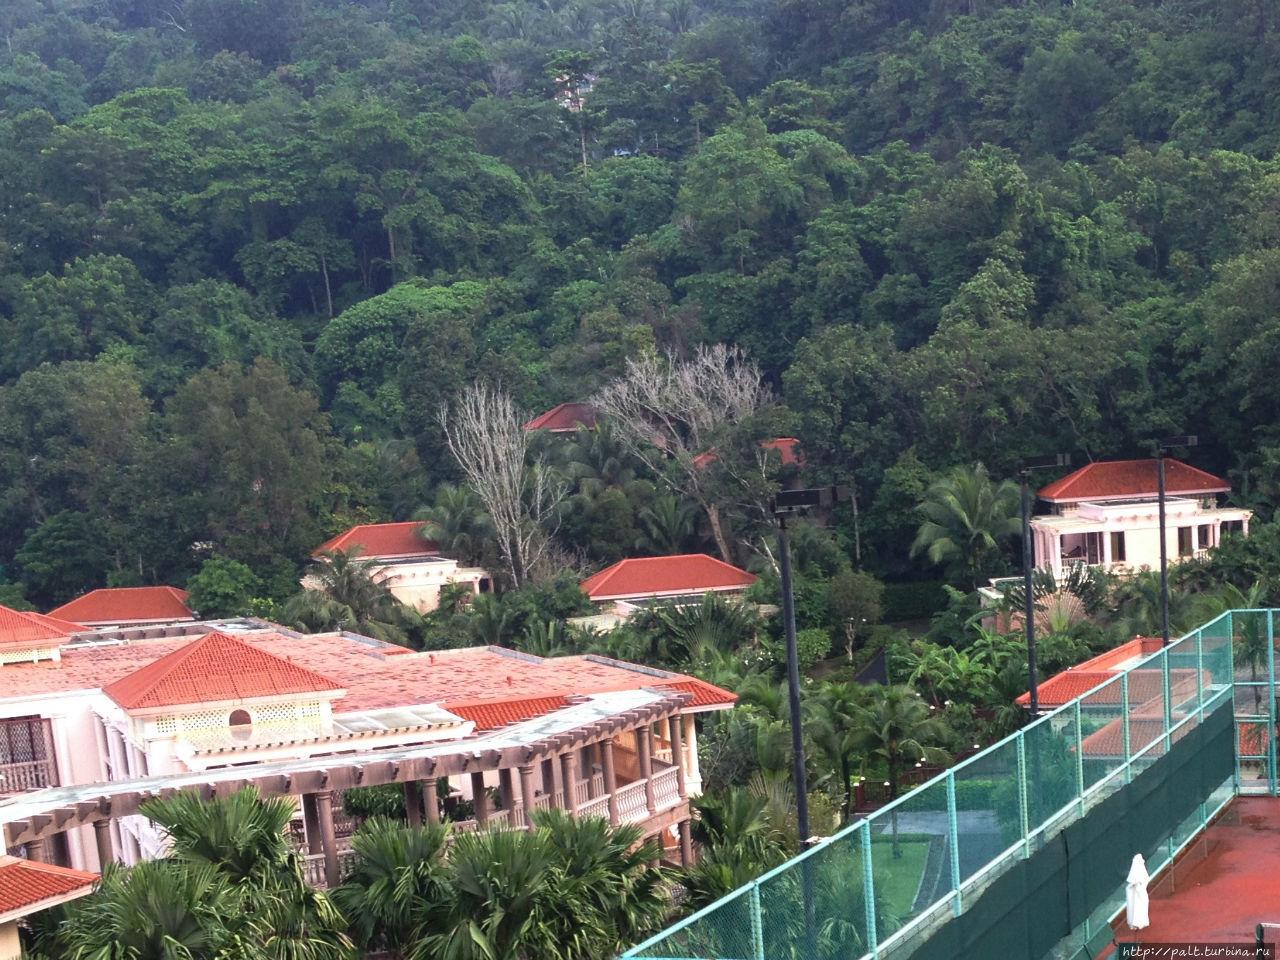 Вид на виллы отеля из кор